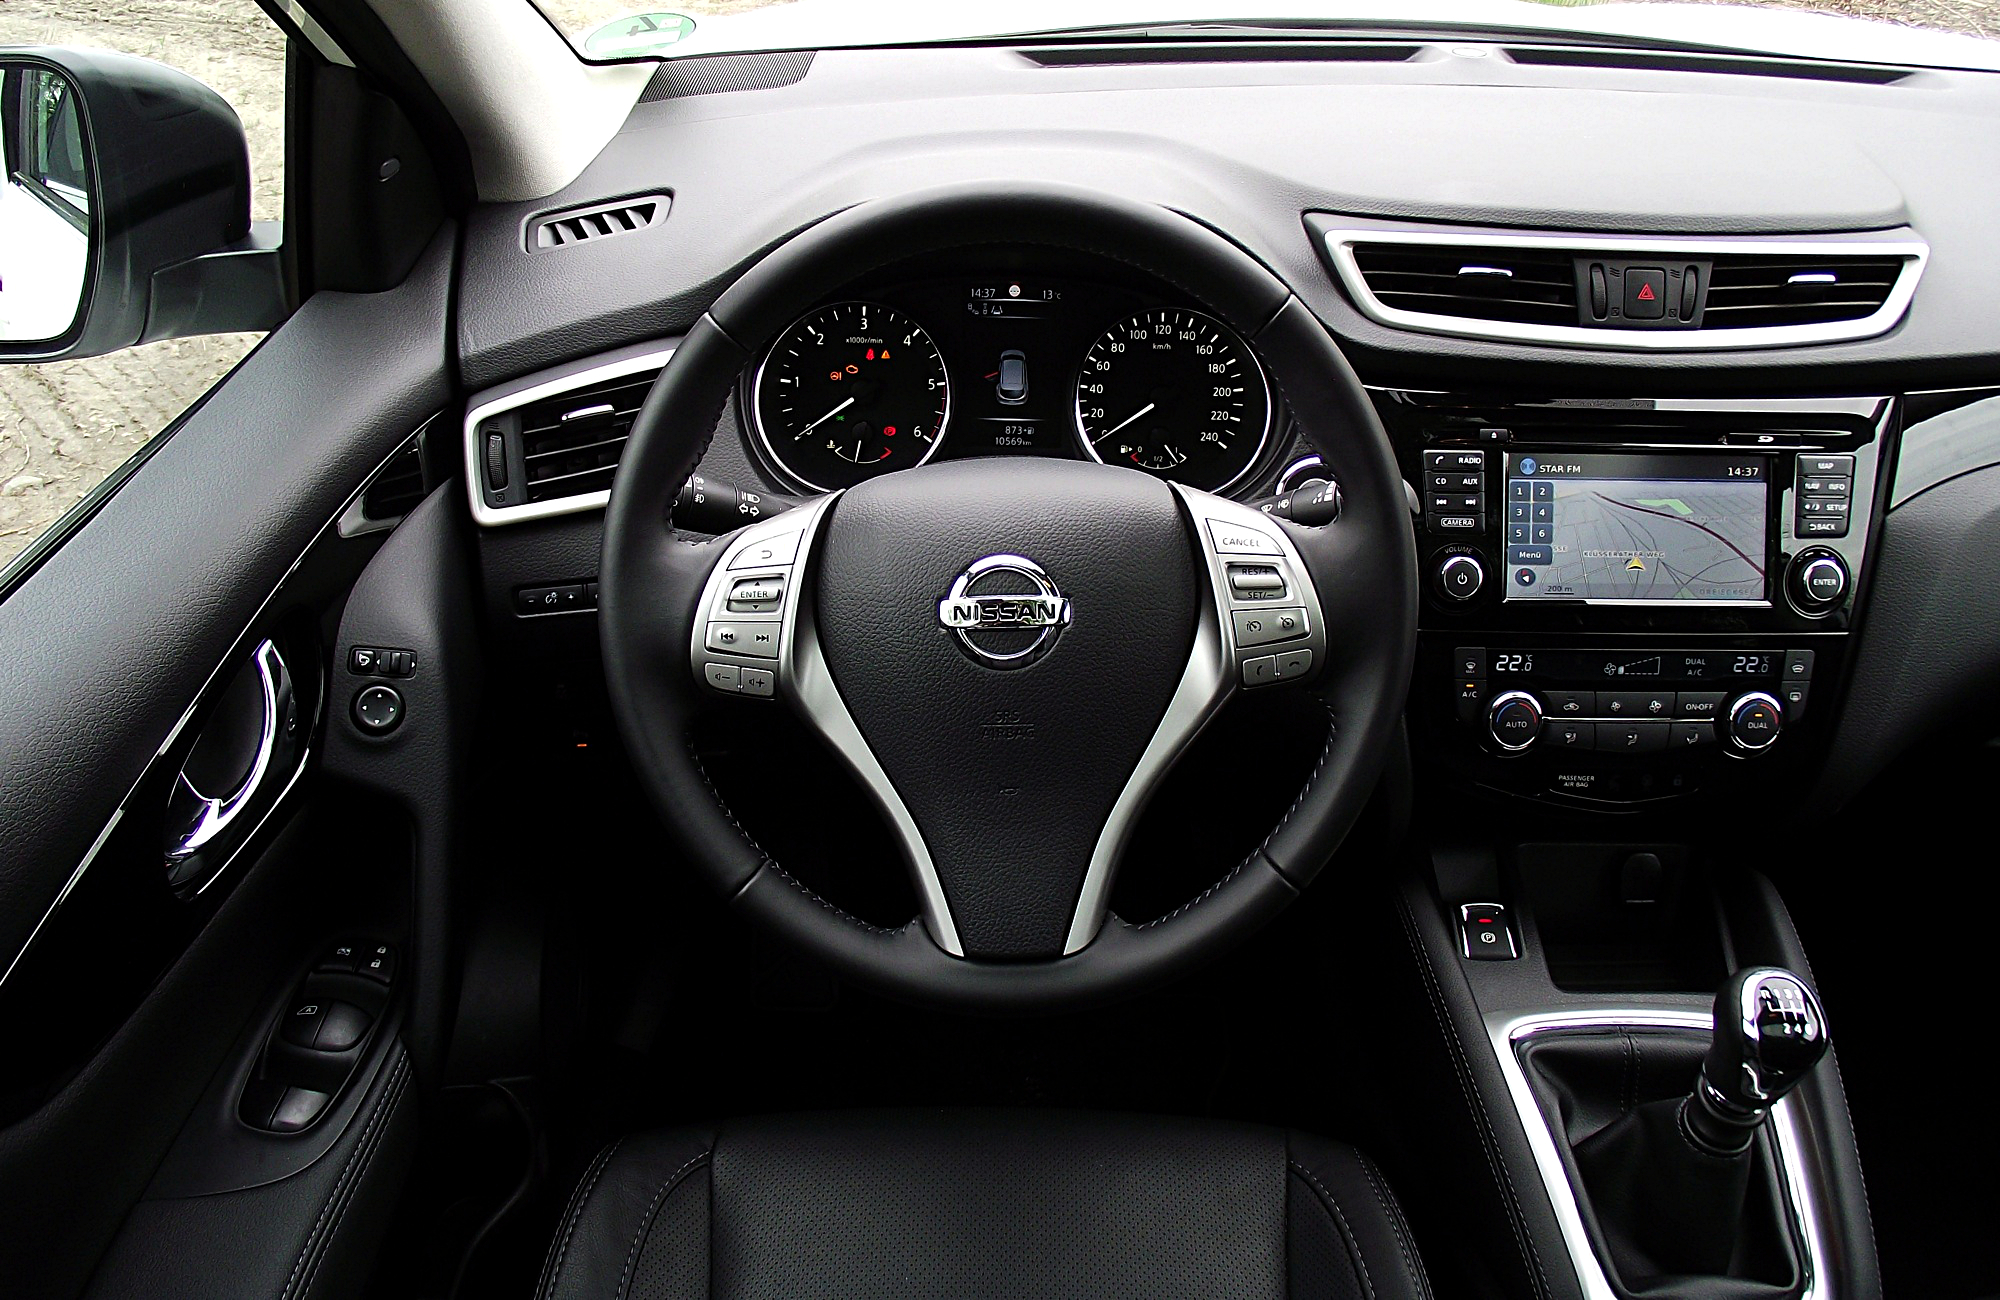 Nissan_Qashqai_1.6_dCi_ALL-MODE_4x4i_Tekna_Interieur_Cockpit_Innenraum.JPG